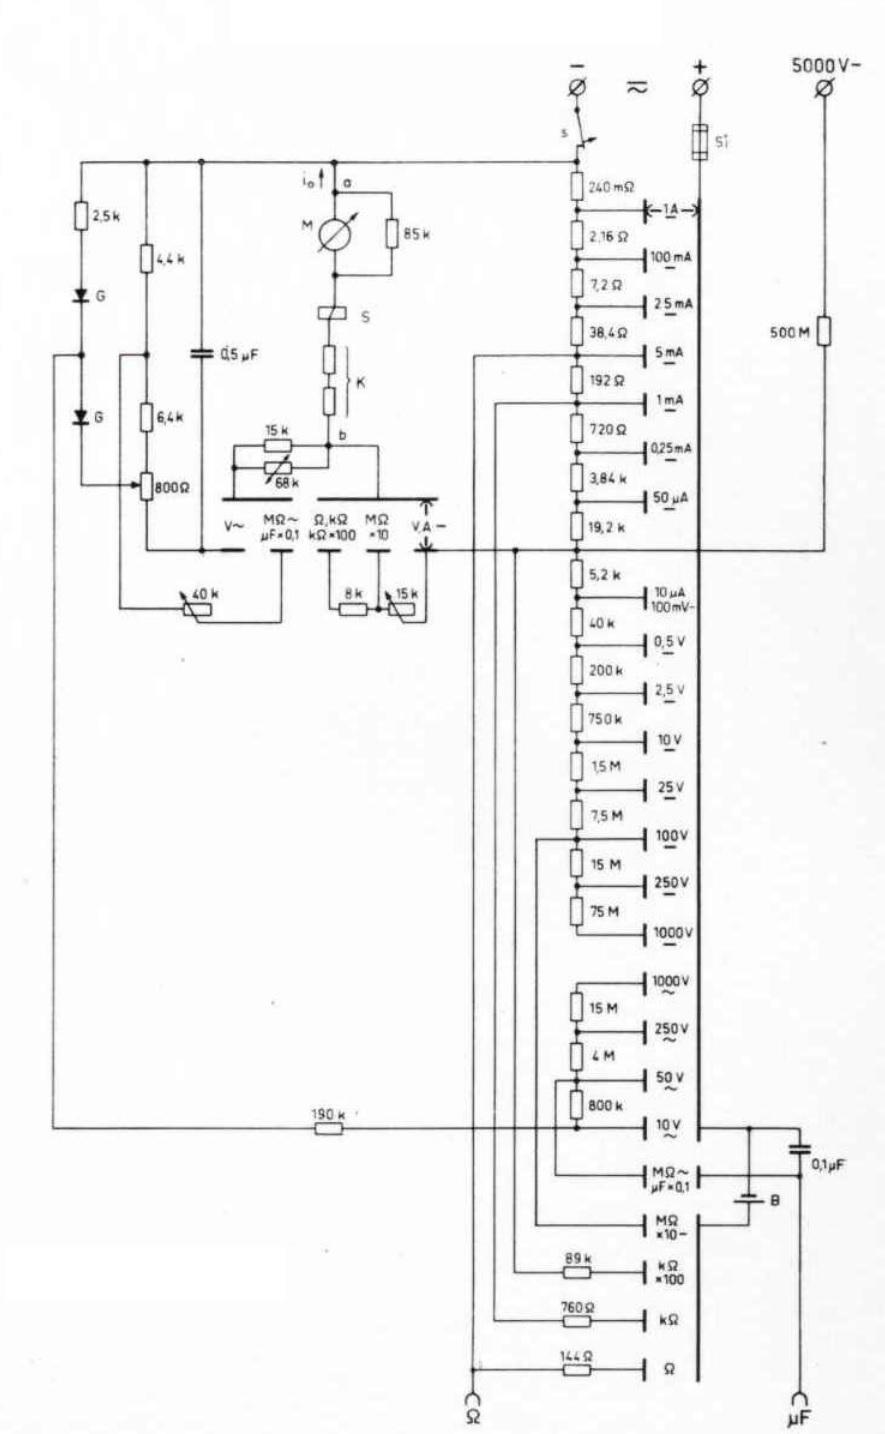 metrawatt unigor 4s analog multimeter circuit diagram [ 885 x 1434 Pixel ]